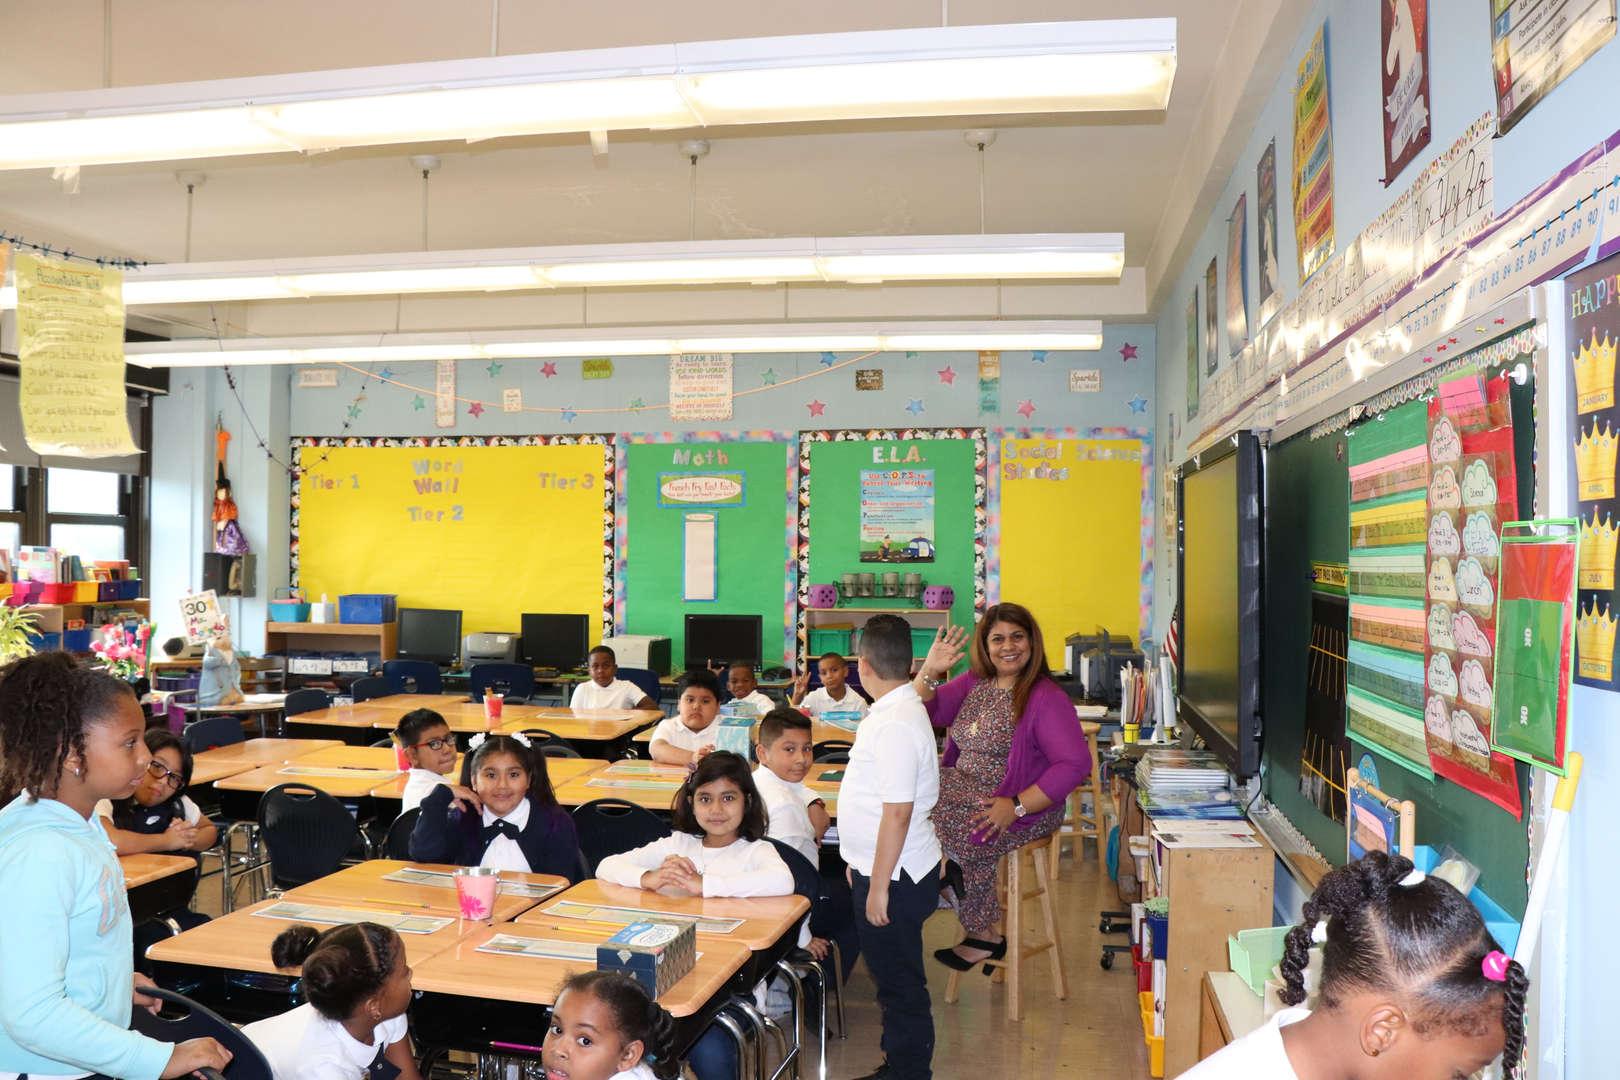 Mrs. Rosado's students working hard.